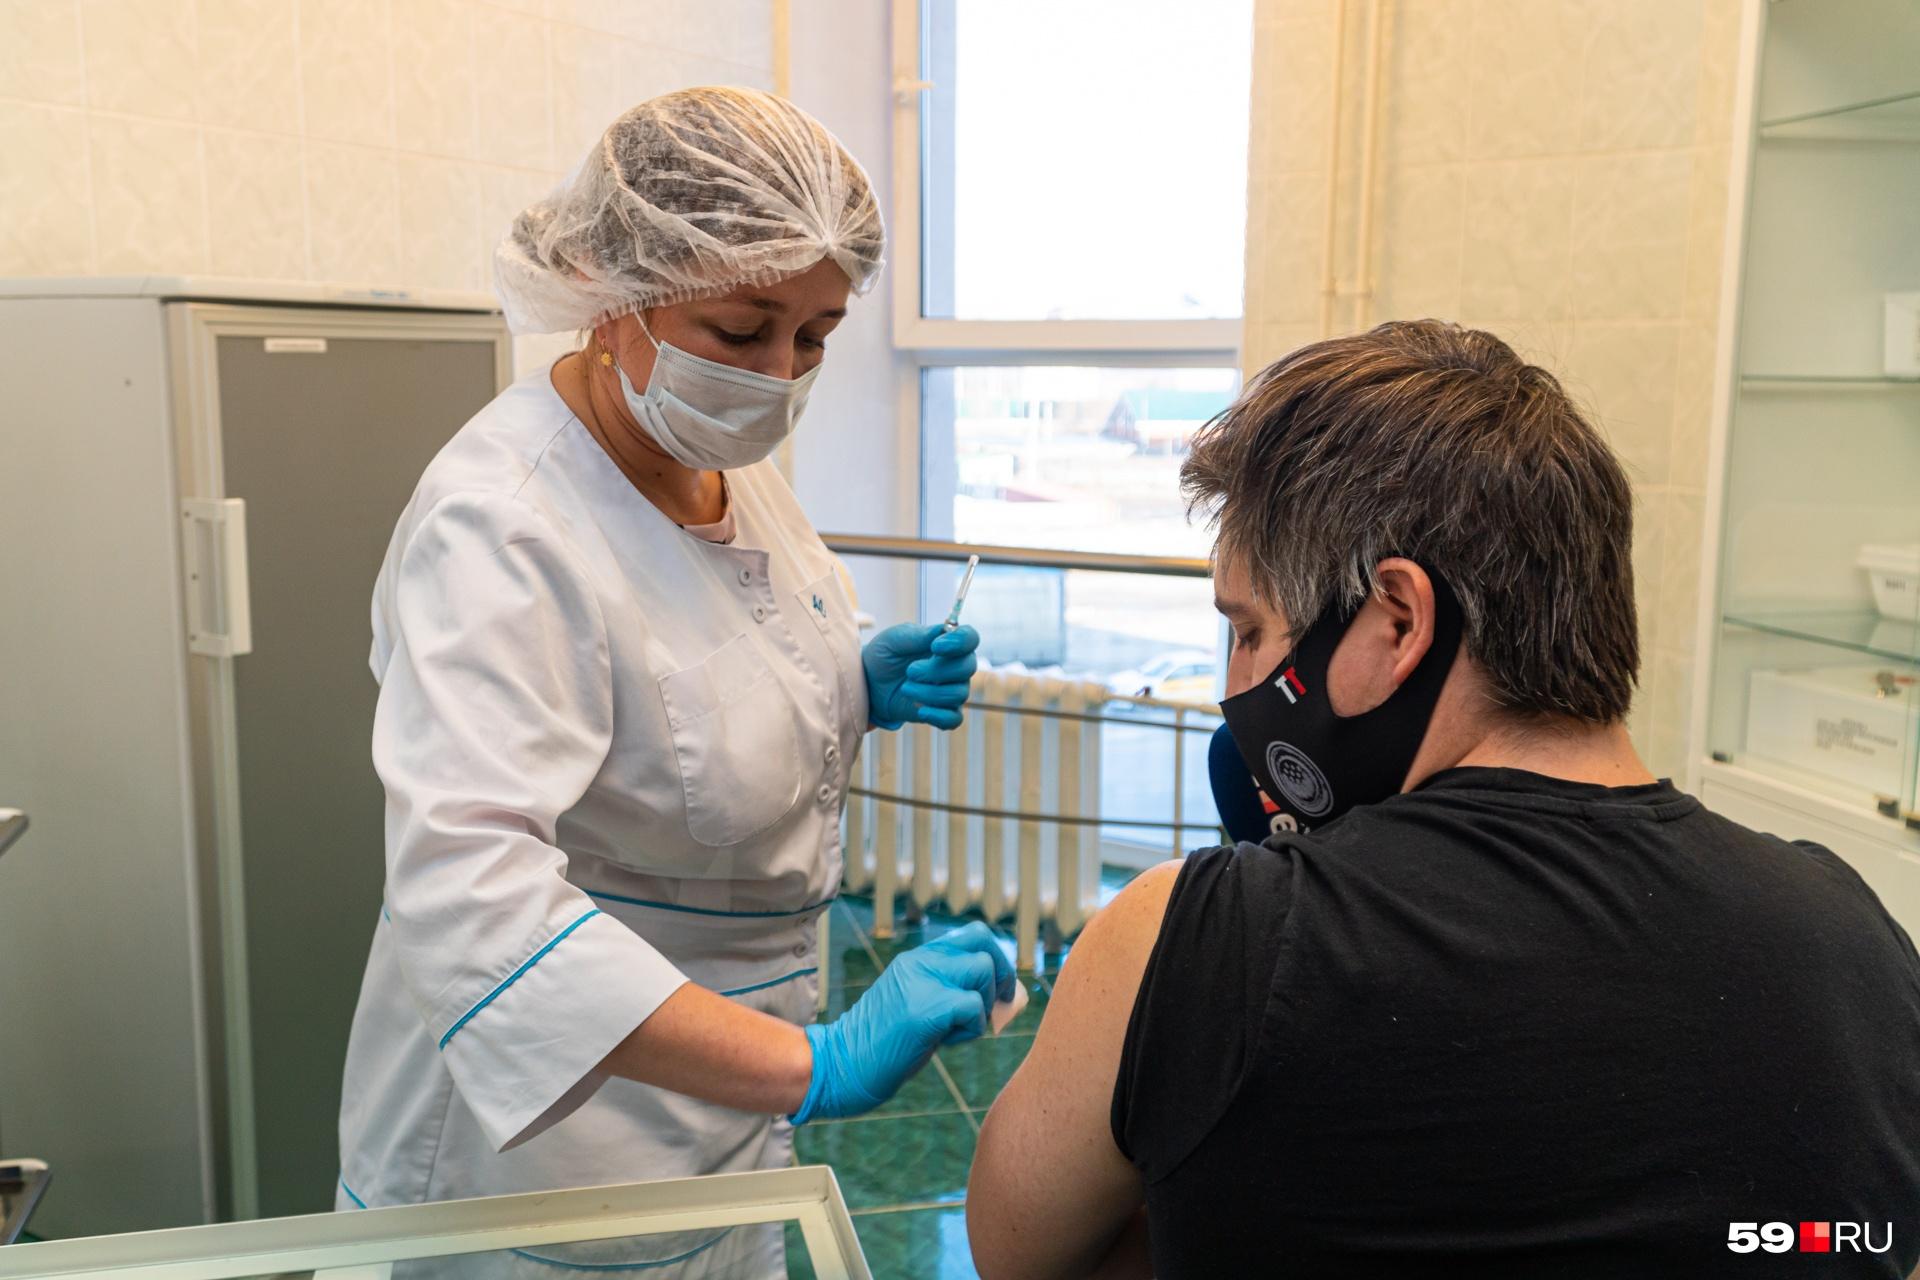 Нашему Тимуру сделали прививку от коронавируса